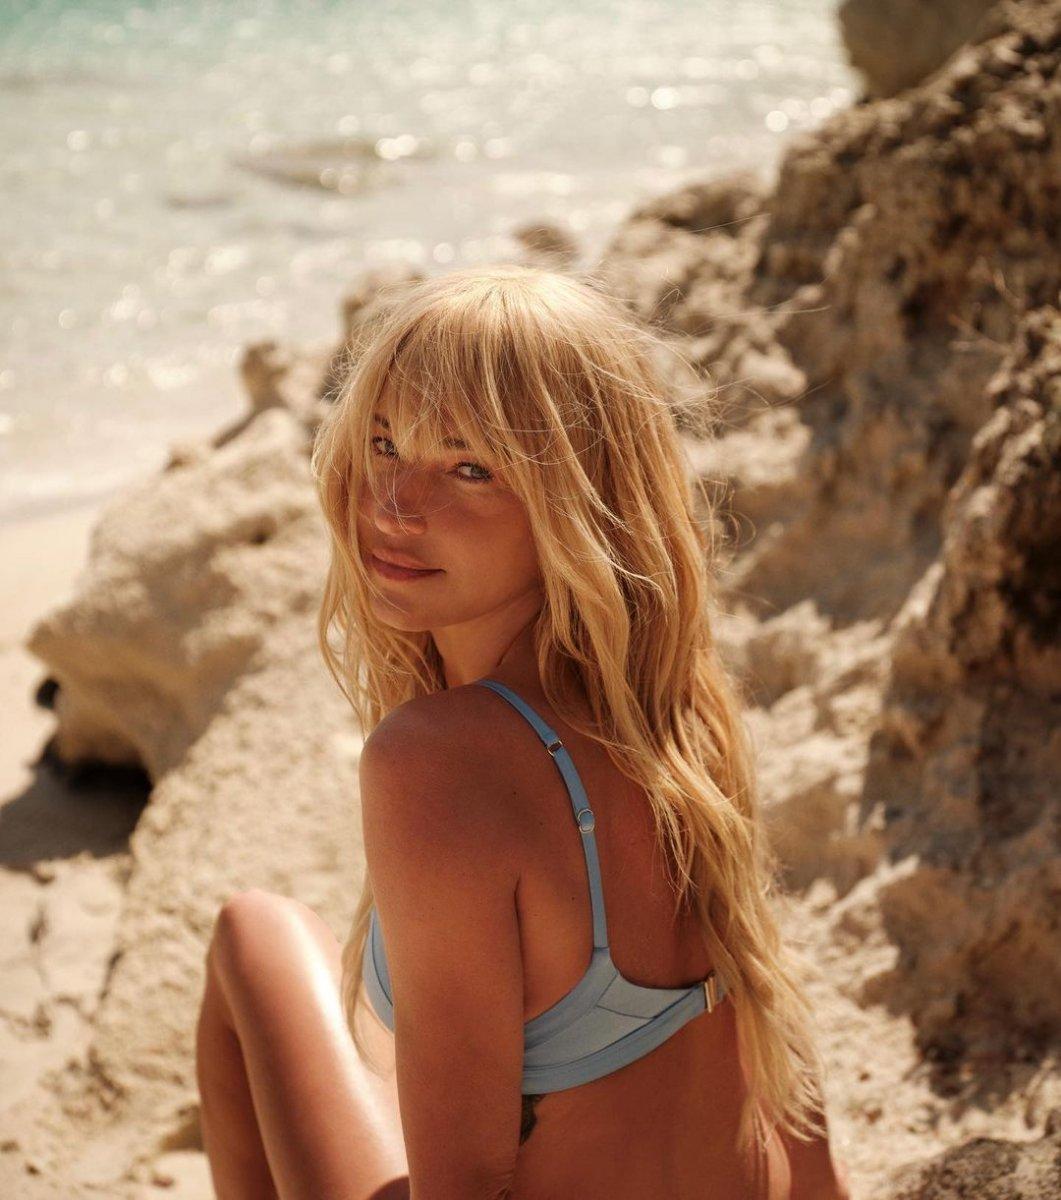 Burcu Esmersoy dan bikinili dans videosu #5